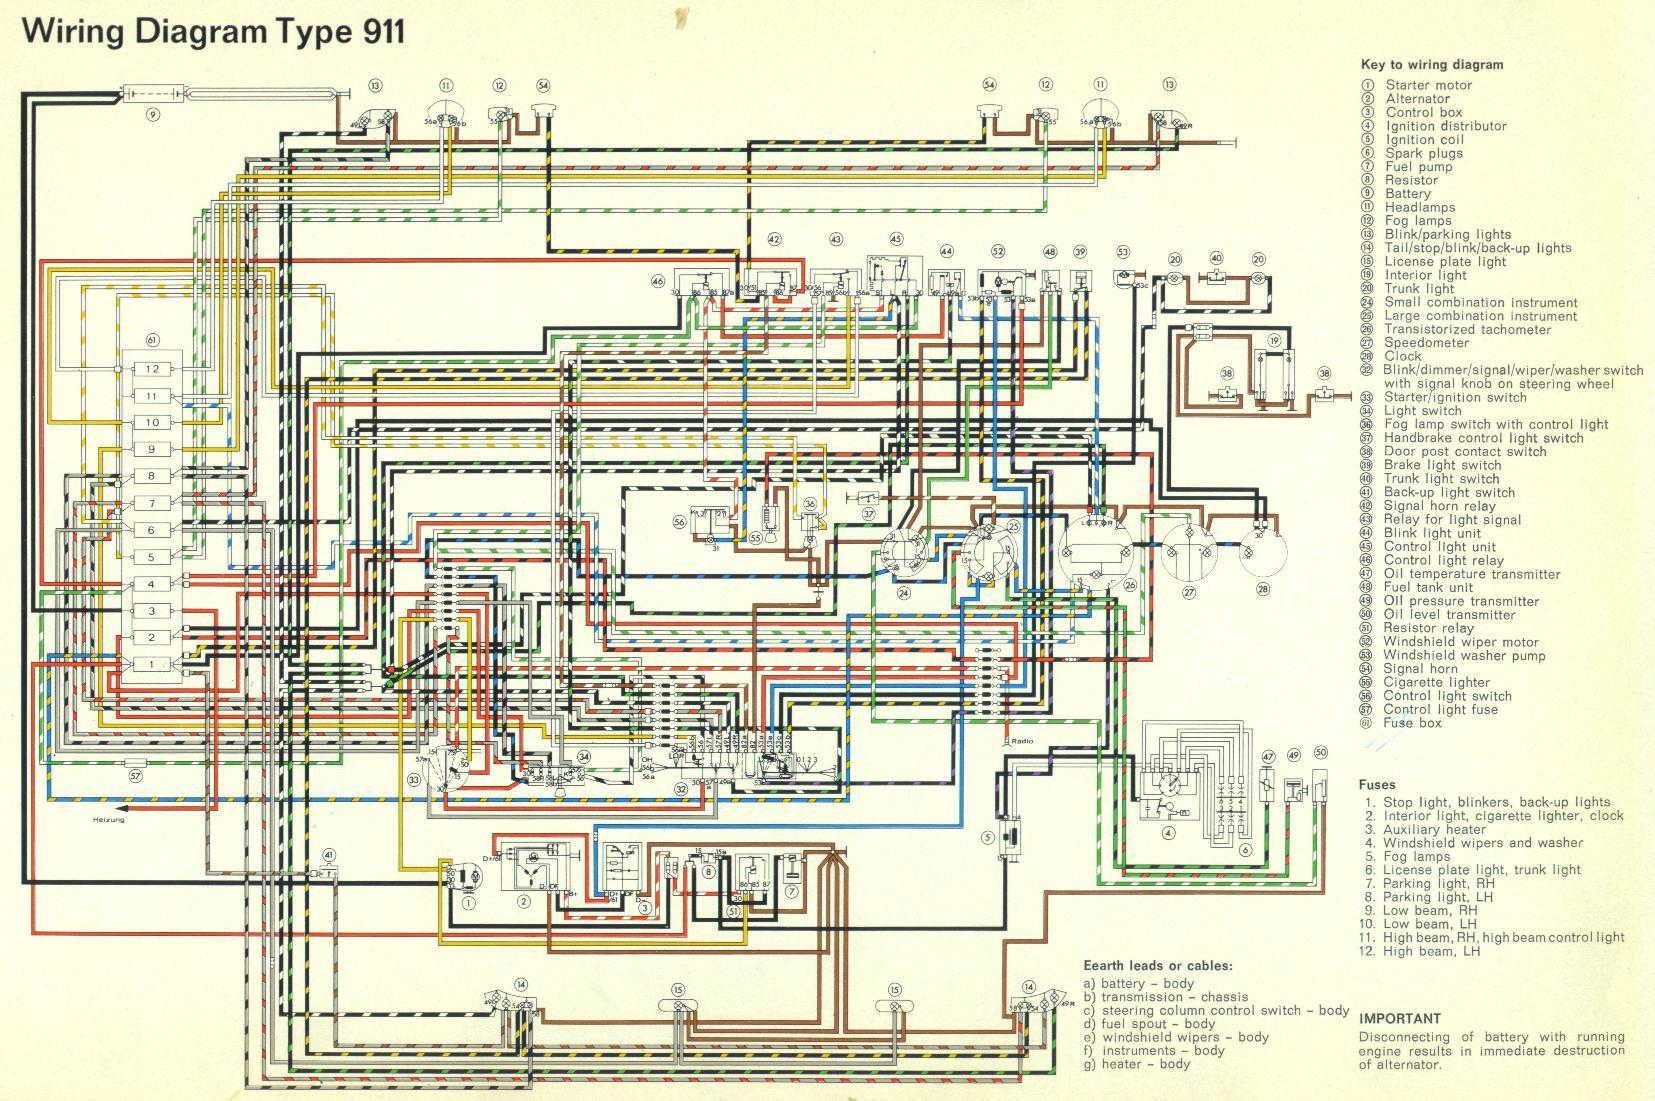 Miraculous Porsche 356 Speedster Wiring Diagram Wiring Diagram Tutorial Wiring Cloud Licukaidewilluminateatxorg